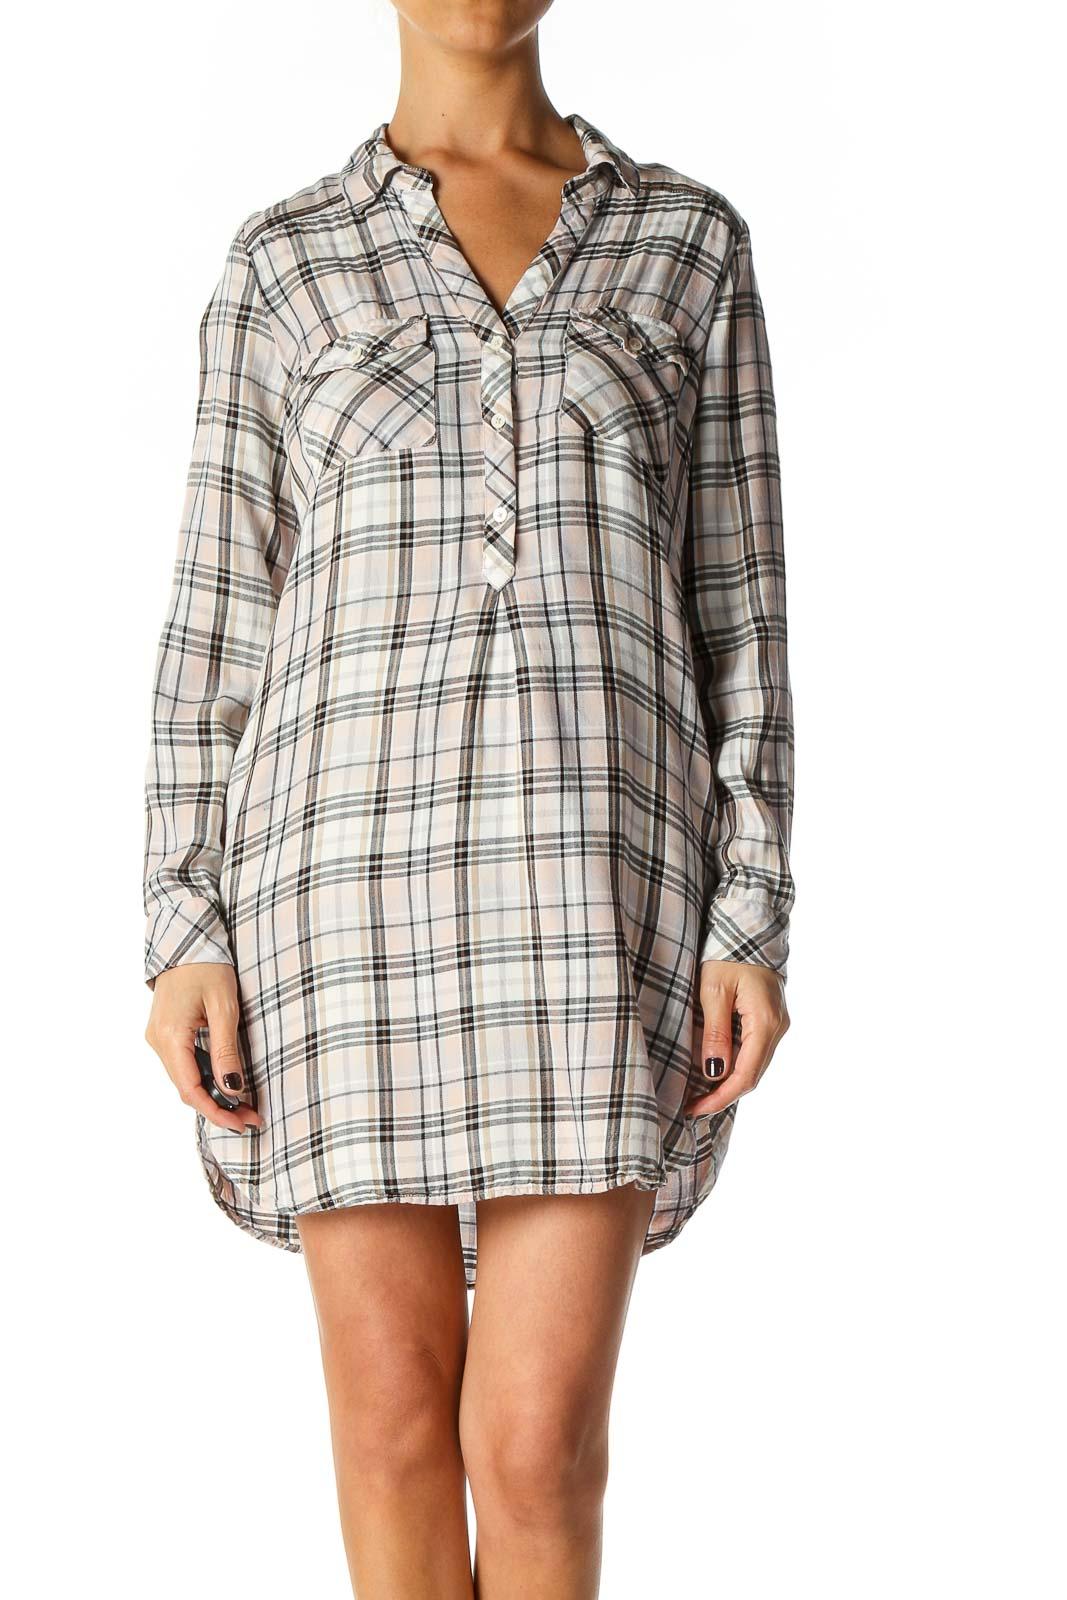 White Checkered Bohemian Shift Dress Front